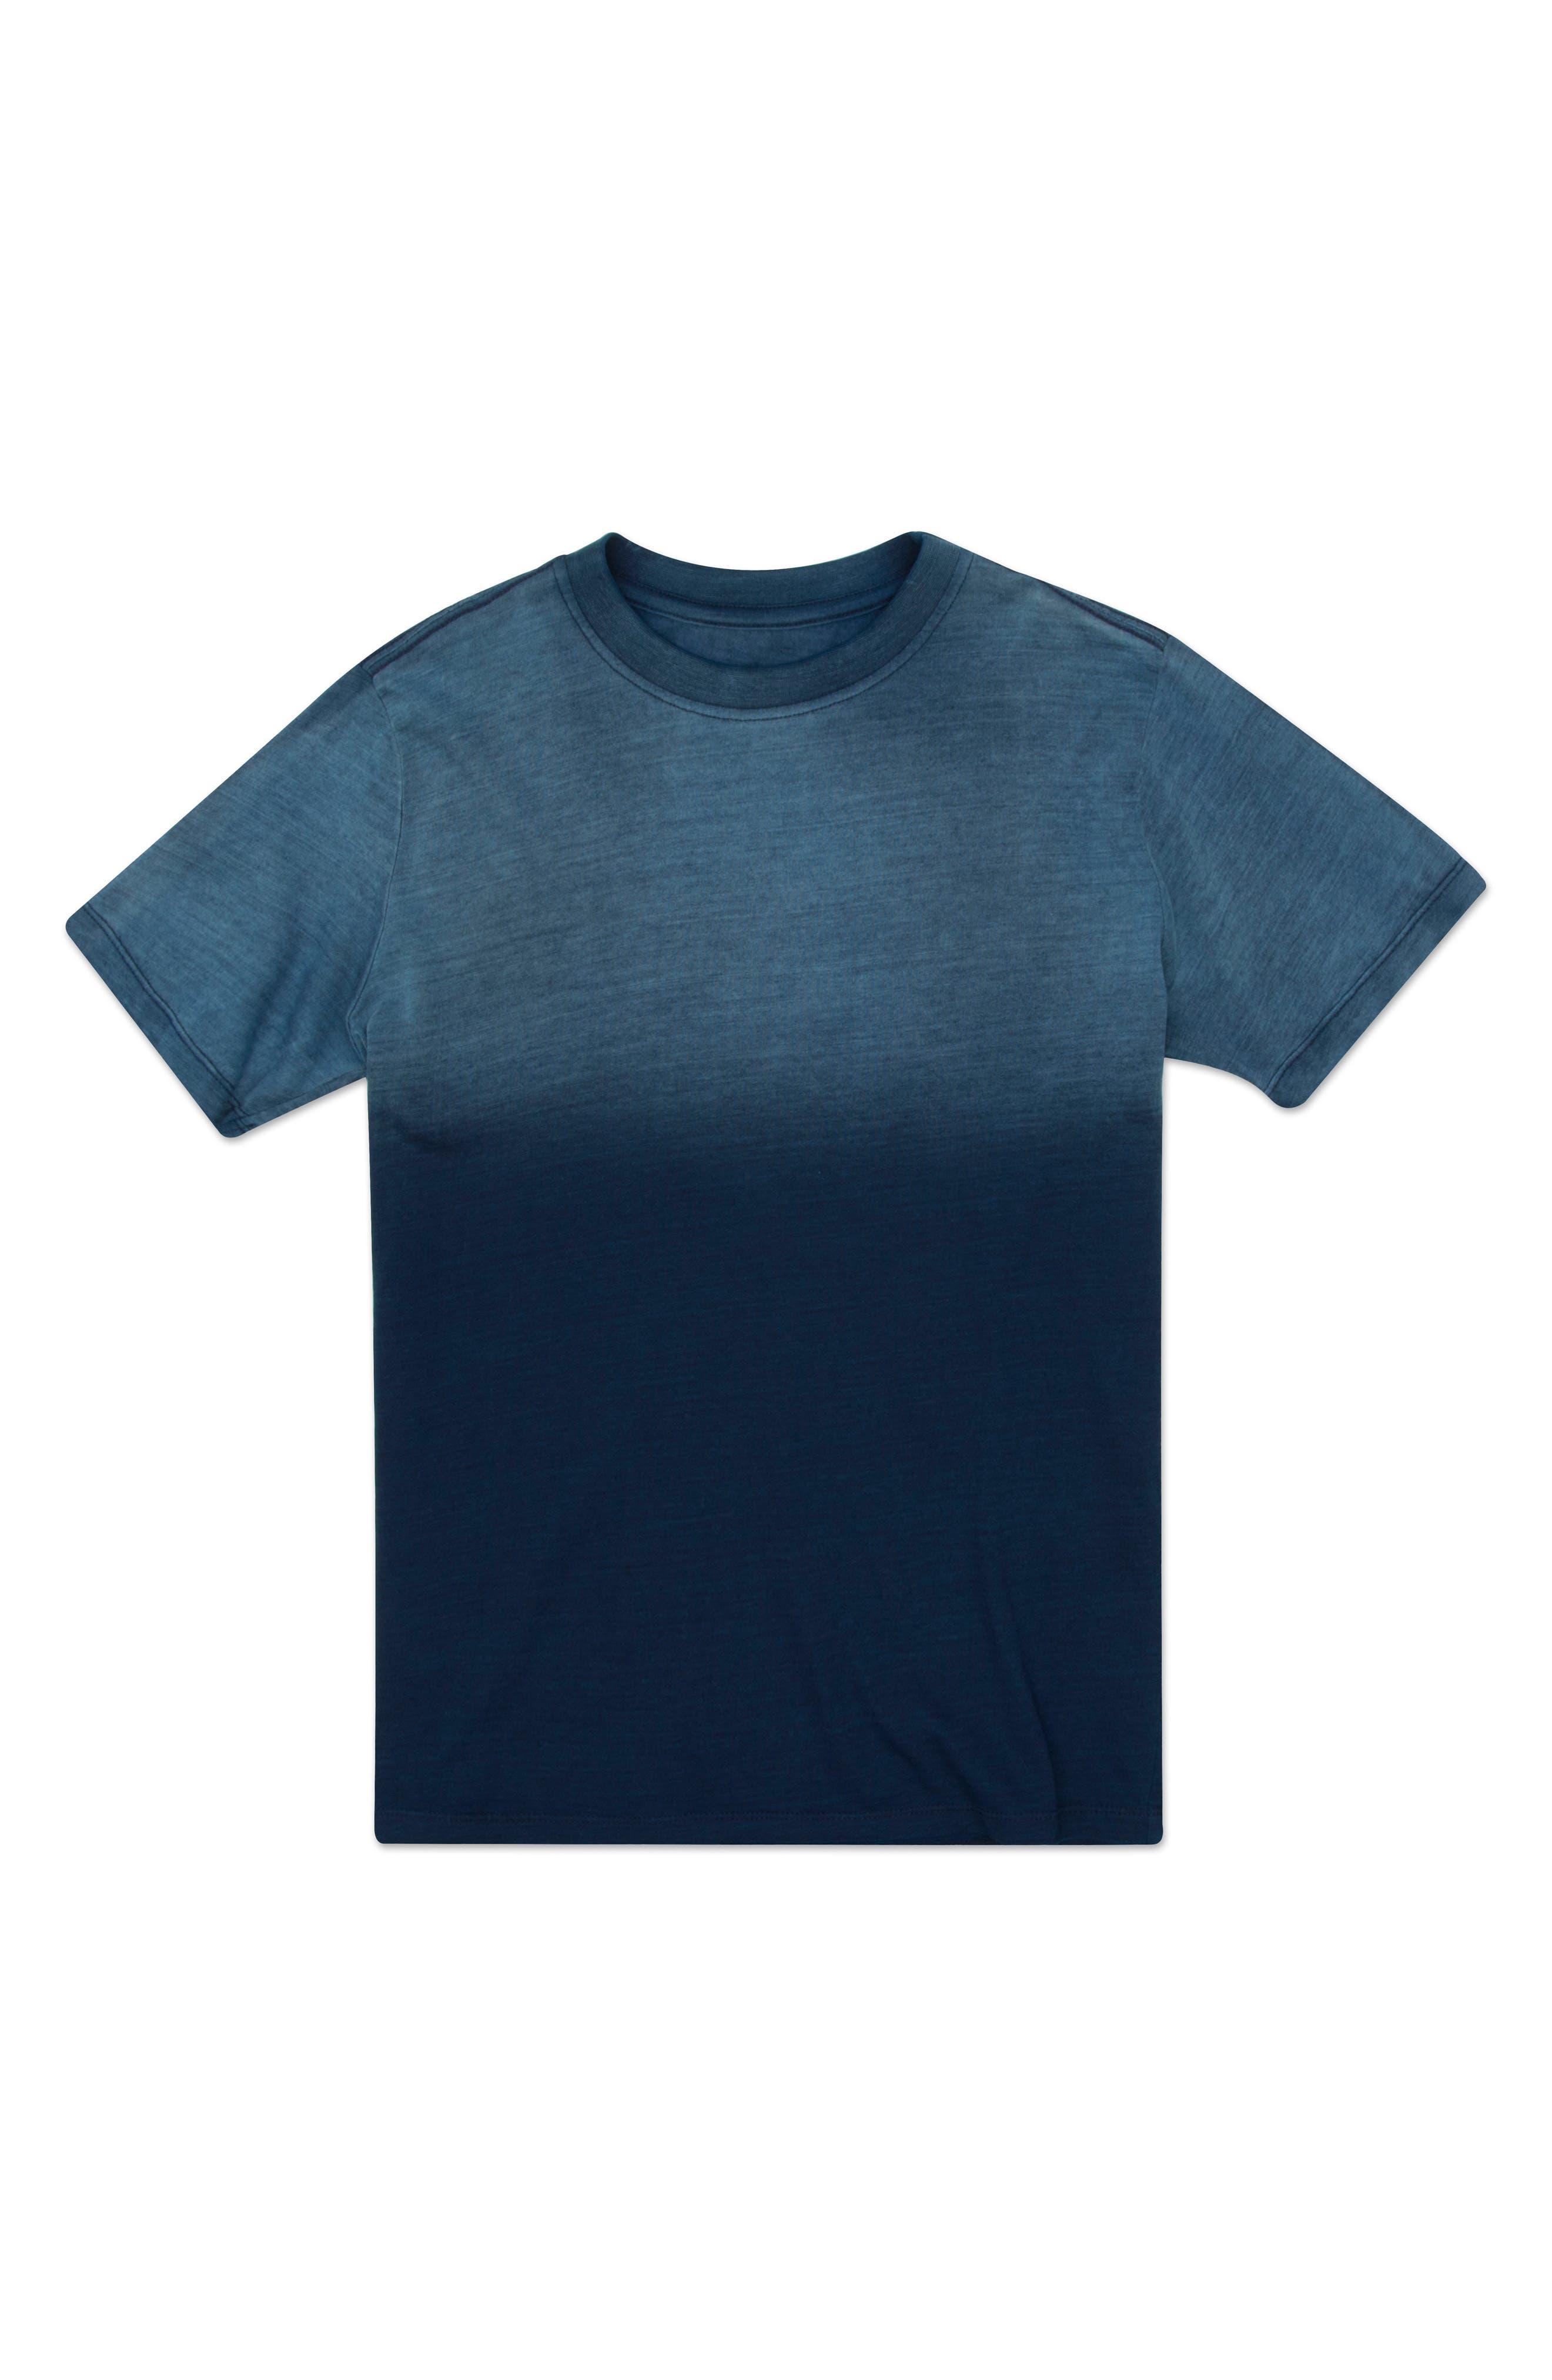 Main Image - ag adriano goldschmied kids Dante Crewneck T-Shirt (Toddler Boys & Little Boys)